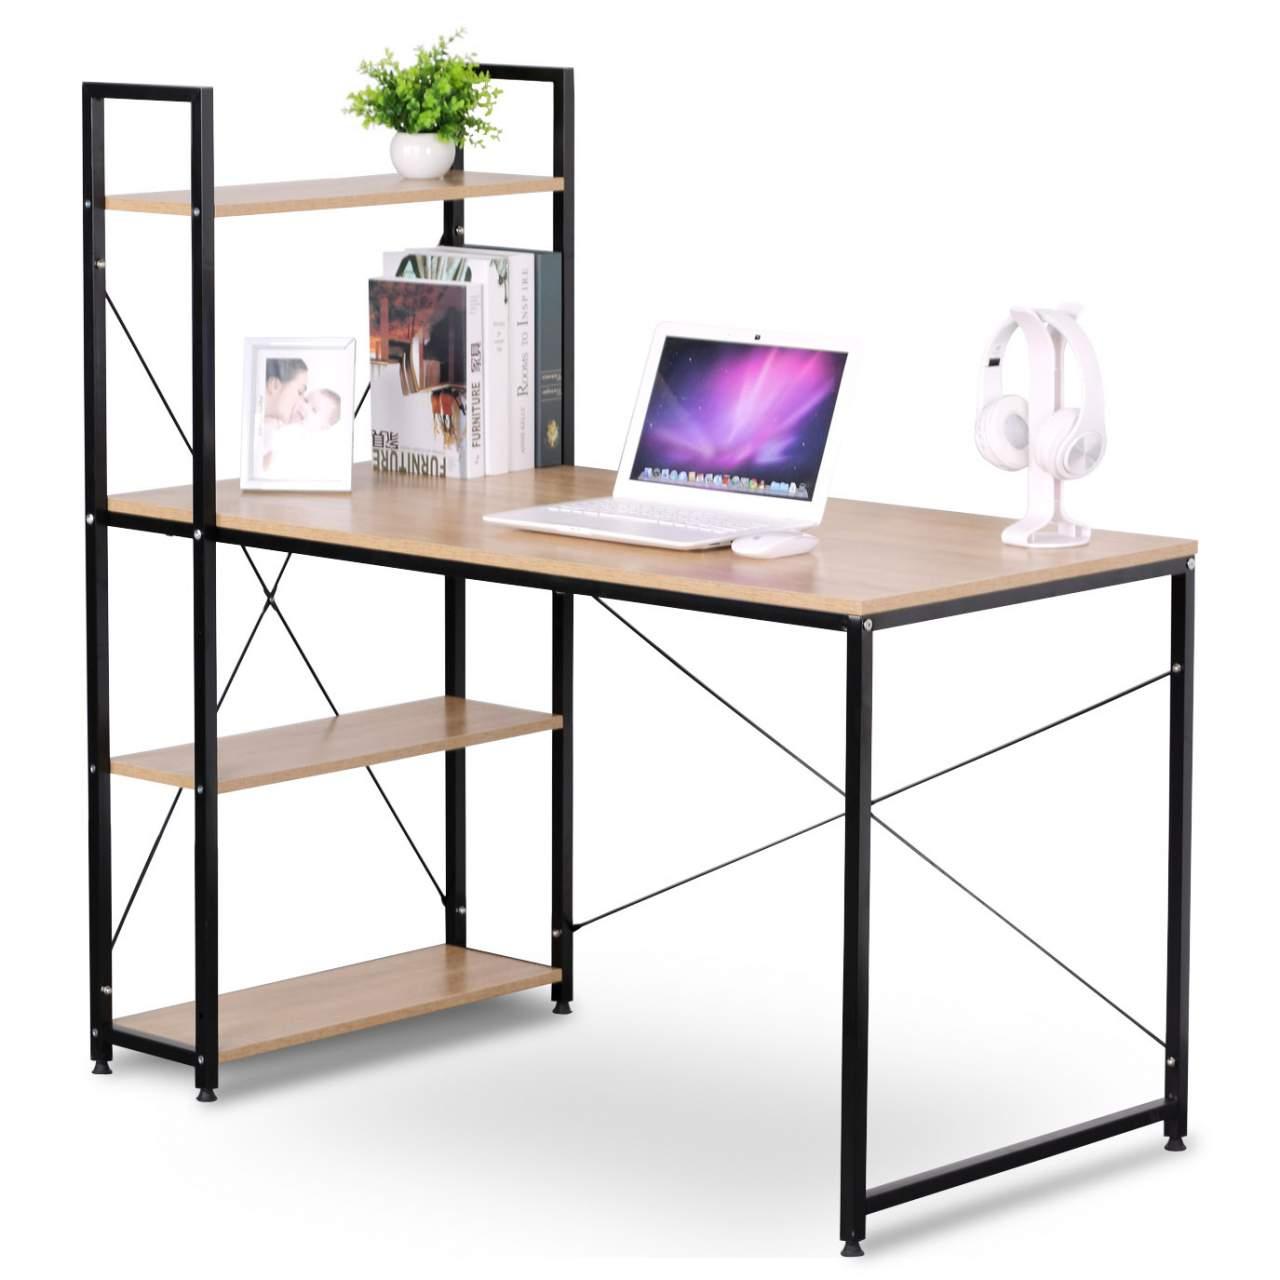 - Computer Desk 4 Shelves For Home Office Woltu.eu